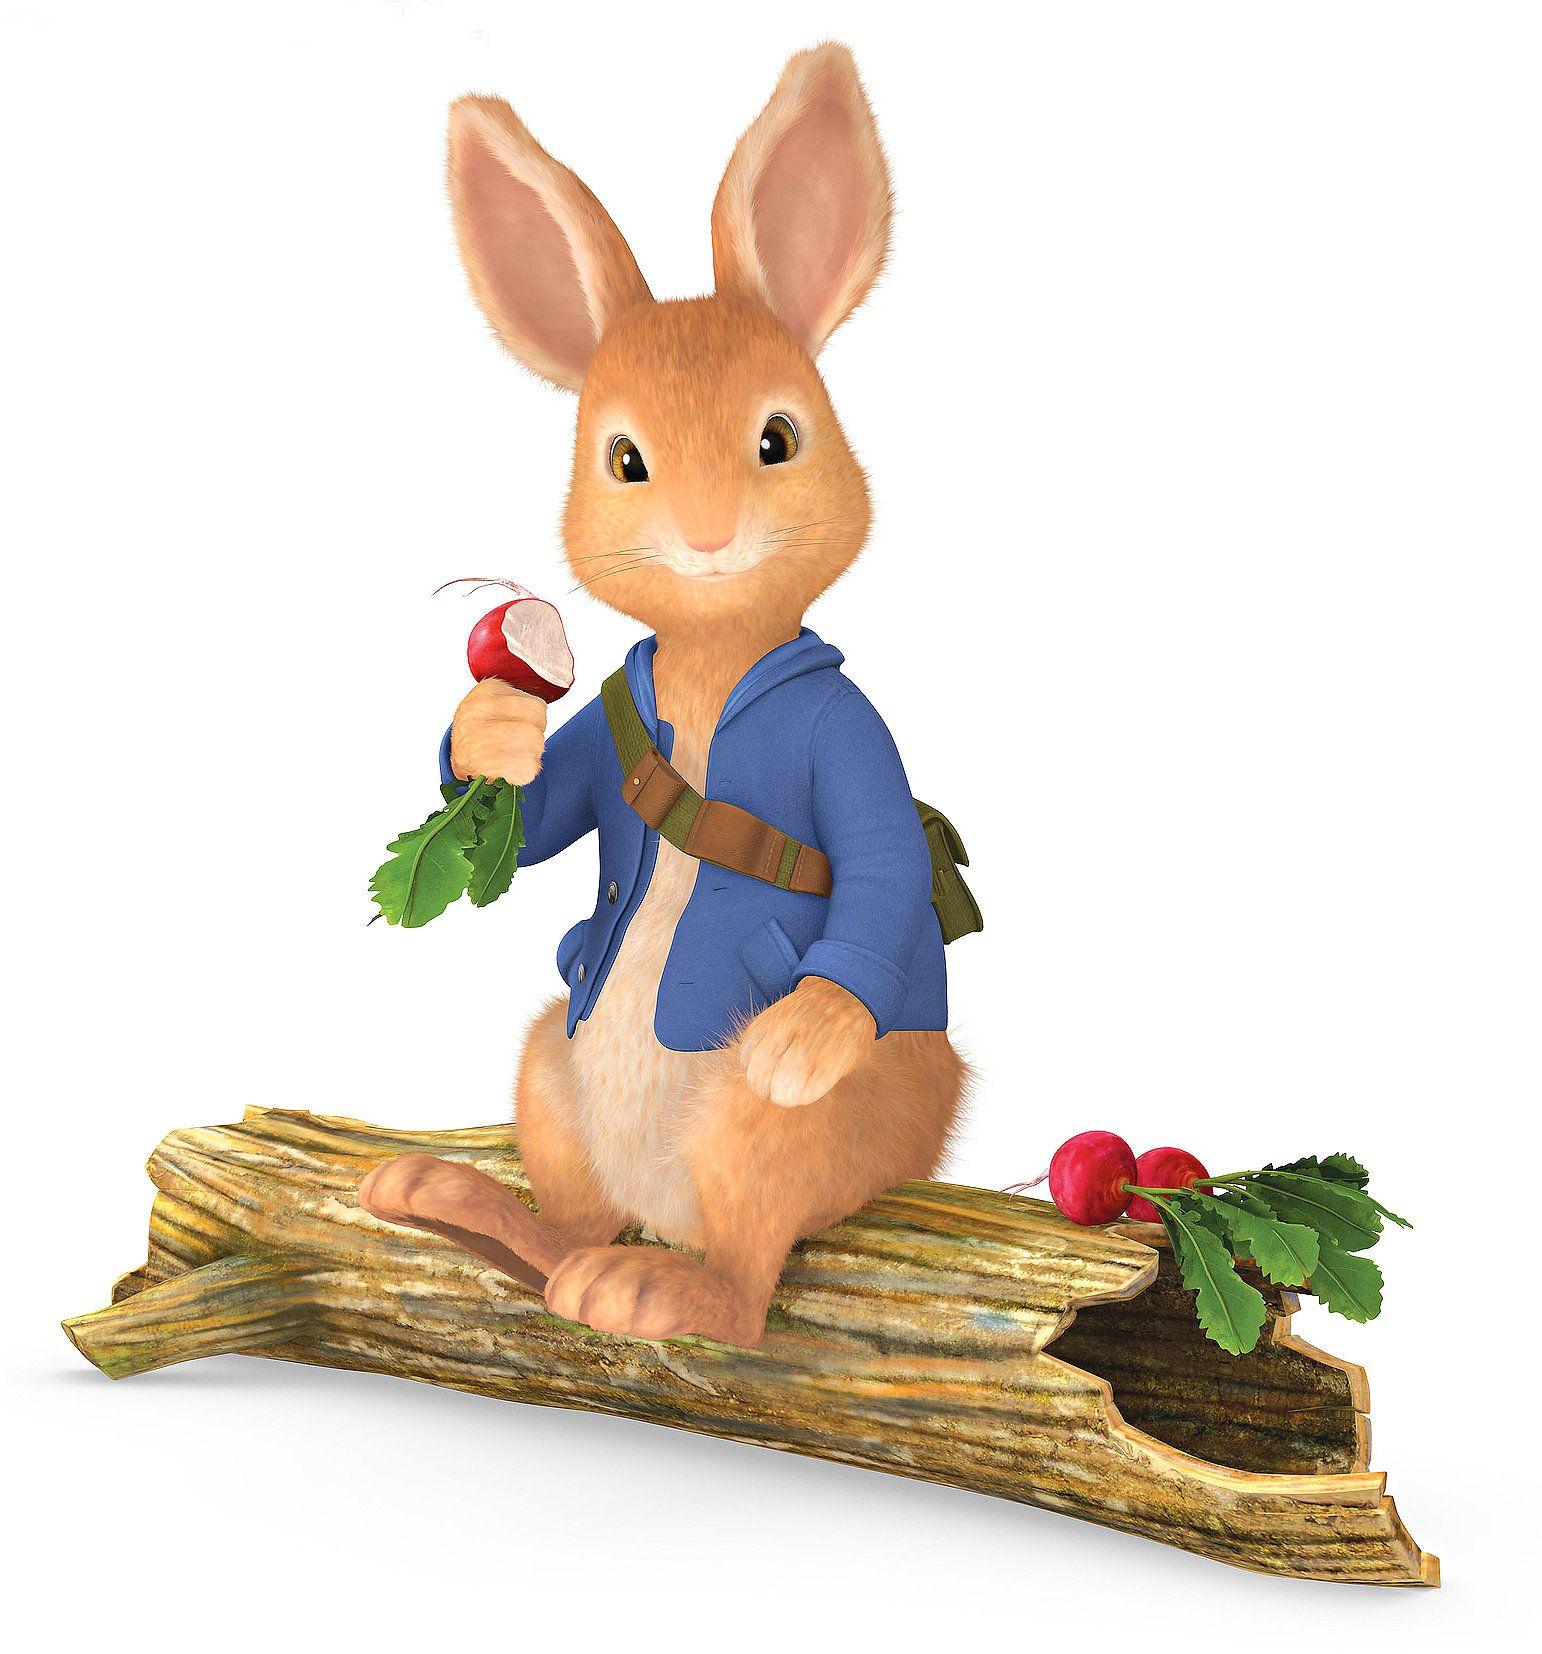 Peter Rabbit S Christmas Tale On Nickelodeon Peter